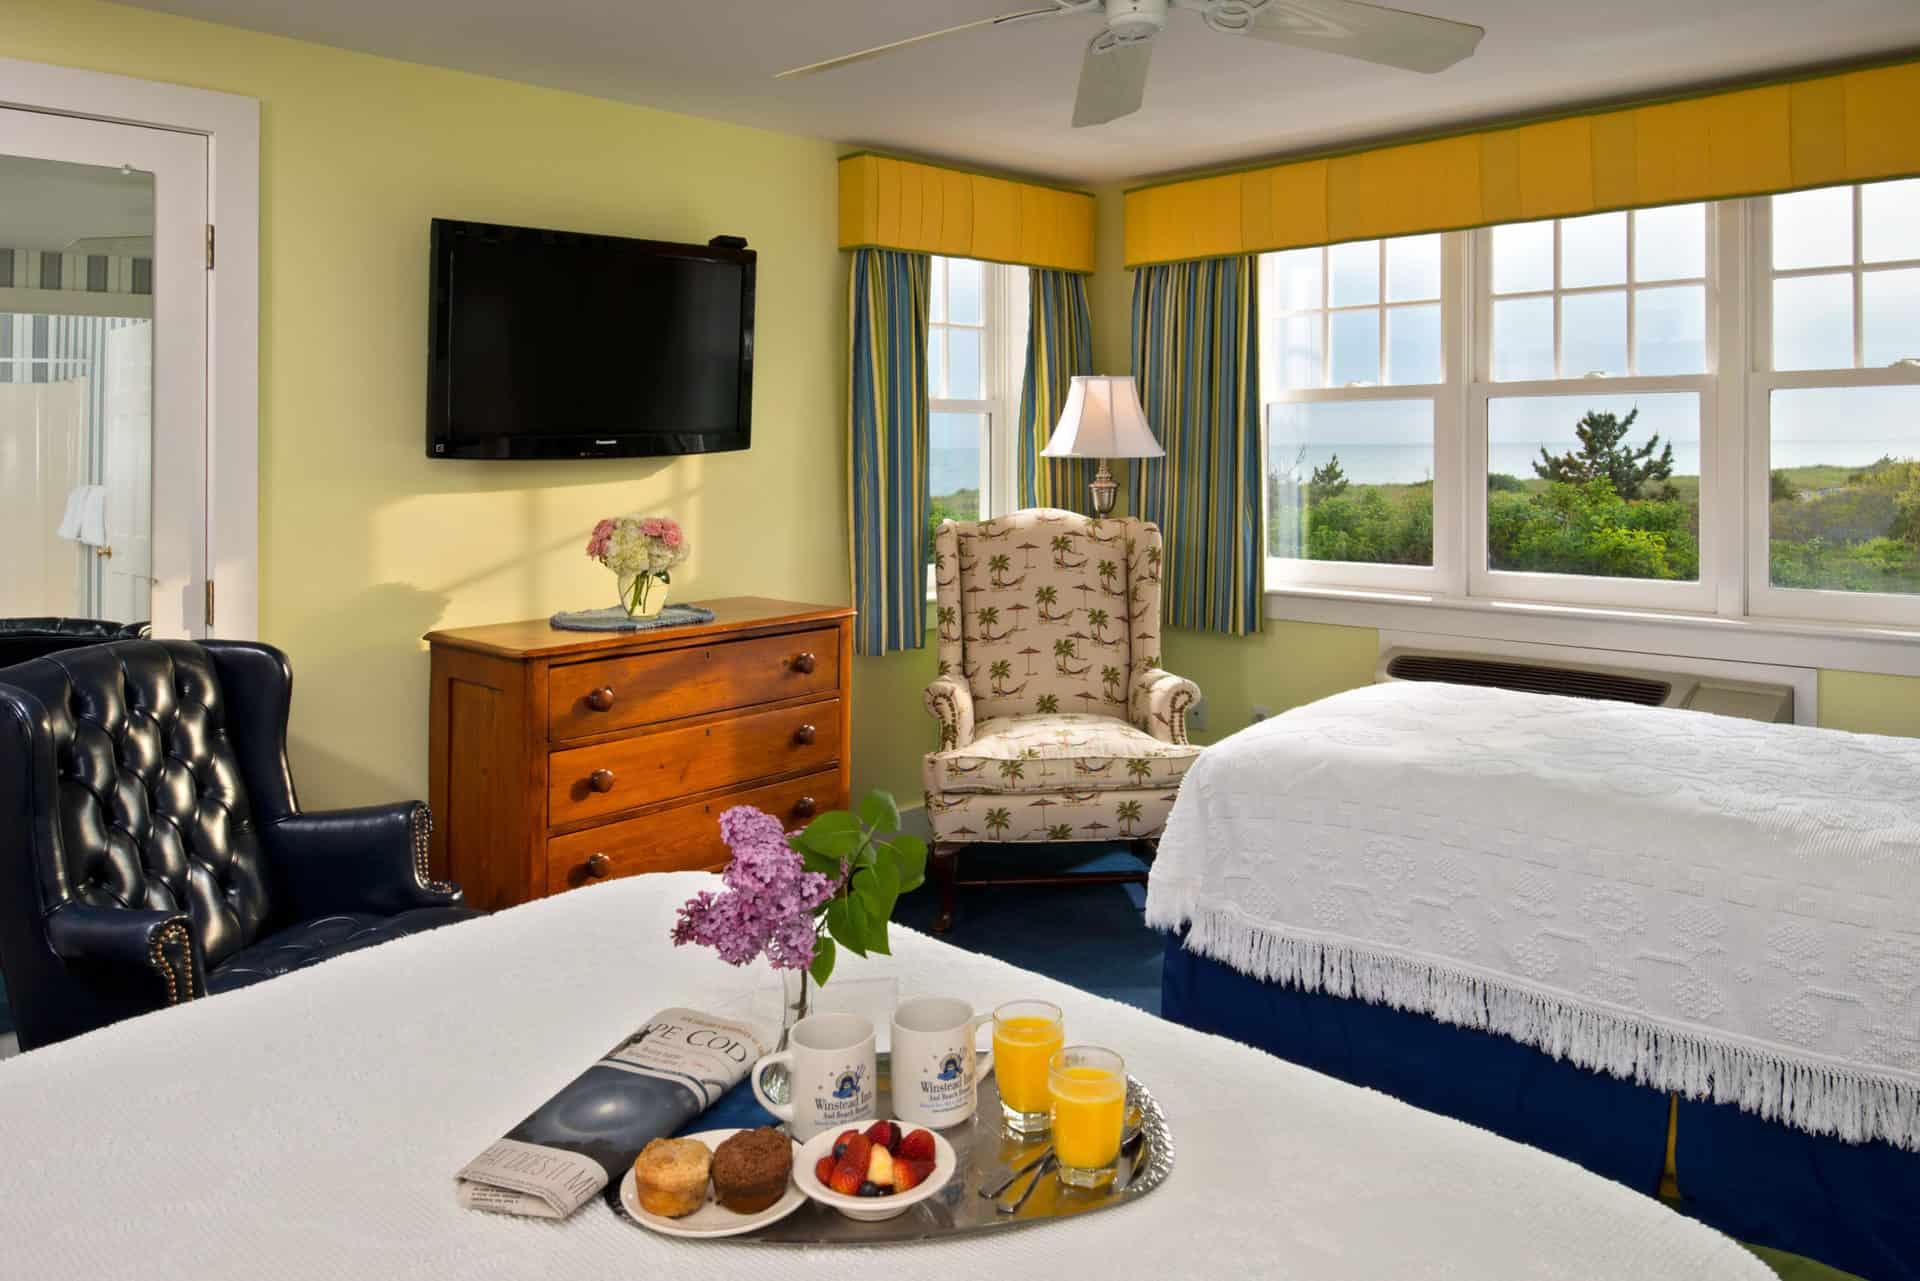 Room 2 beds, dresser and TV